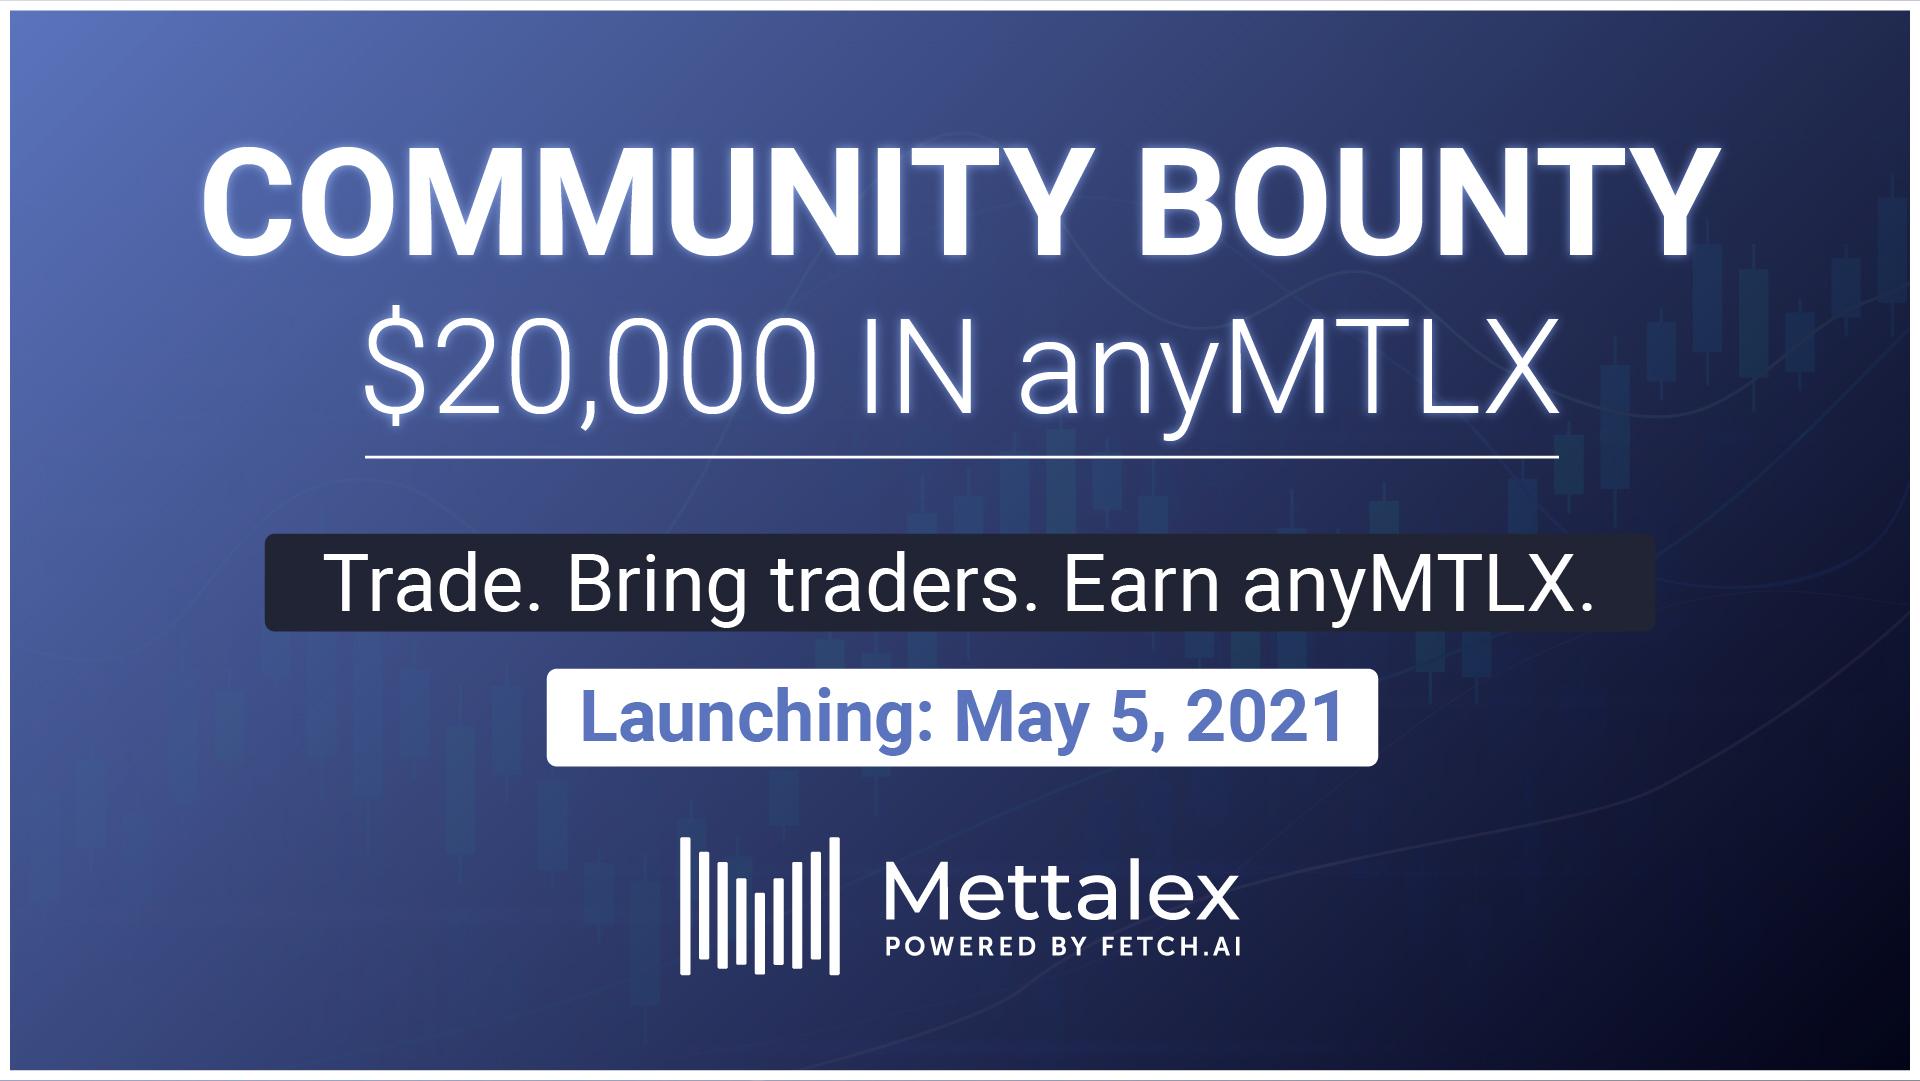 https://mettalex.com/wp-content/uploads/Community-Bounty_3-1.jpg